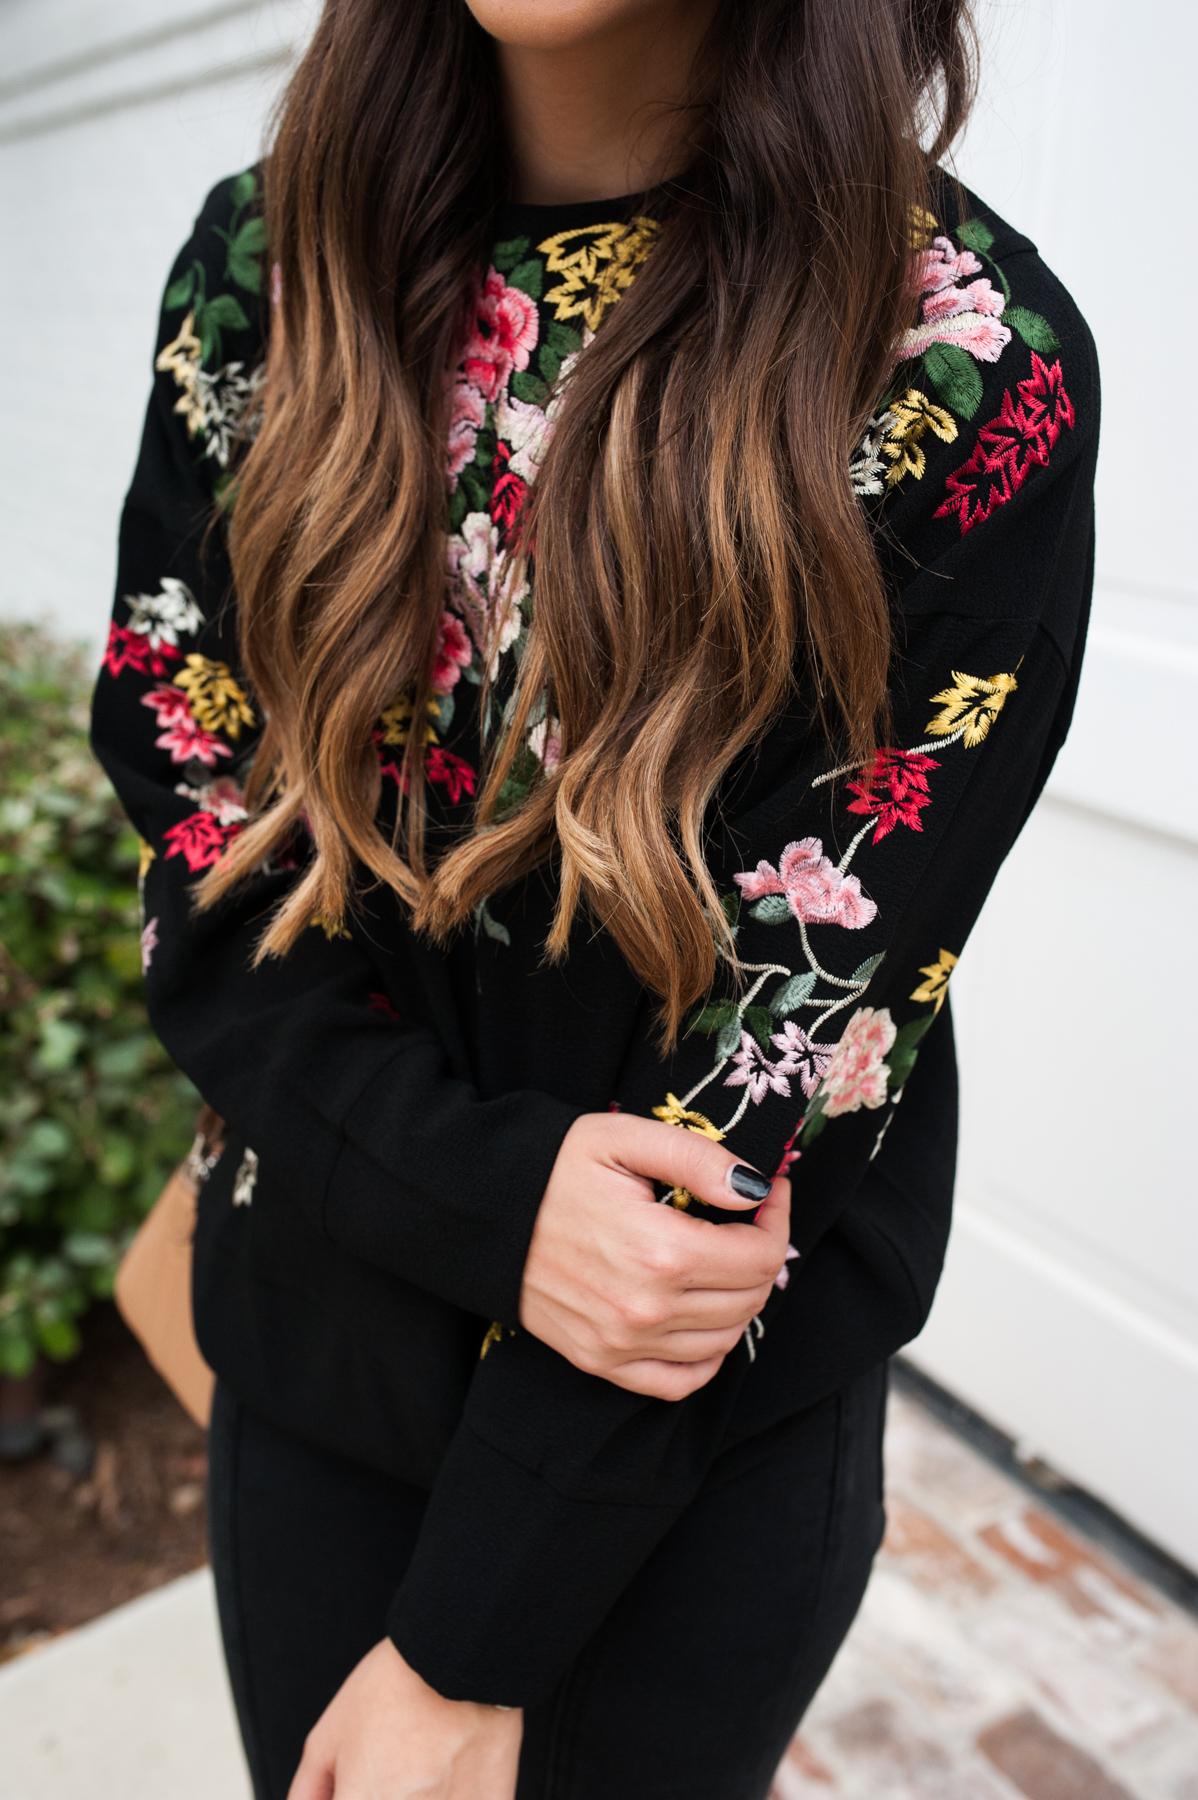 Embroidered Flower Sweatshirt | Dress Up Buttercup